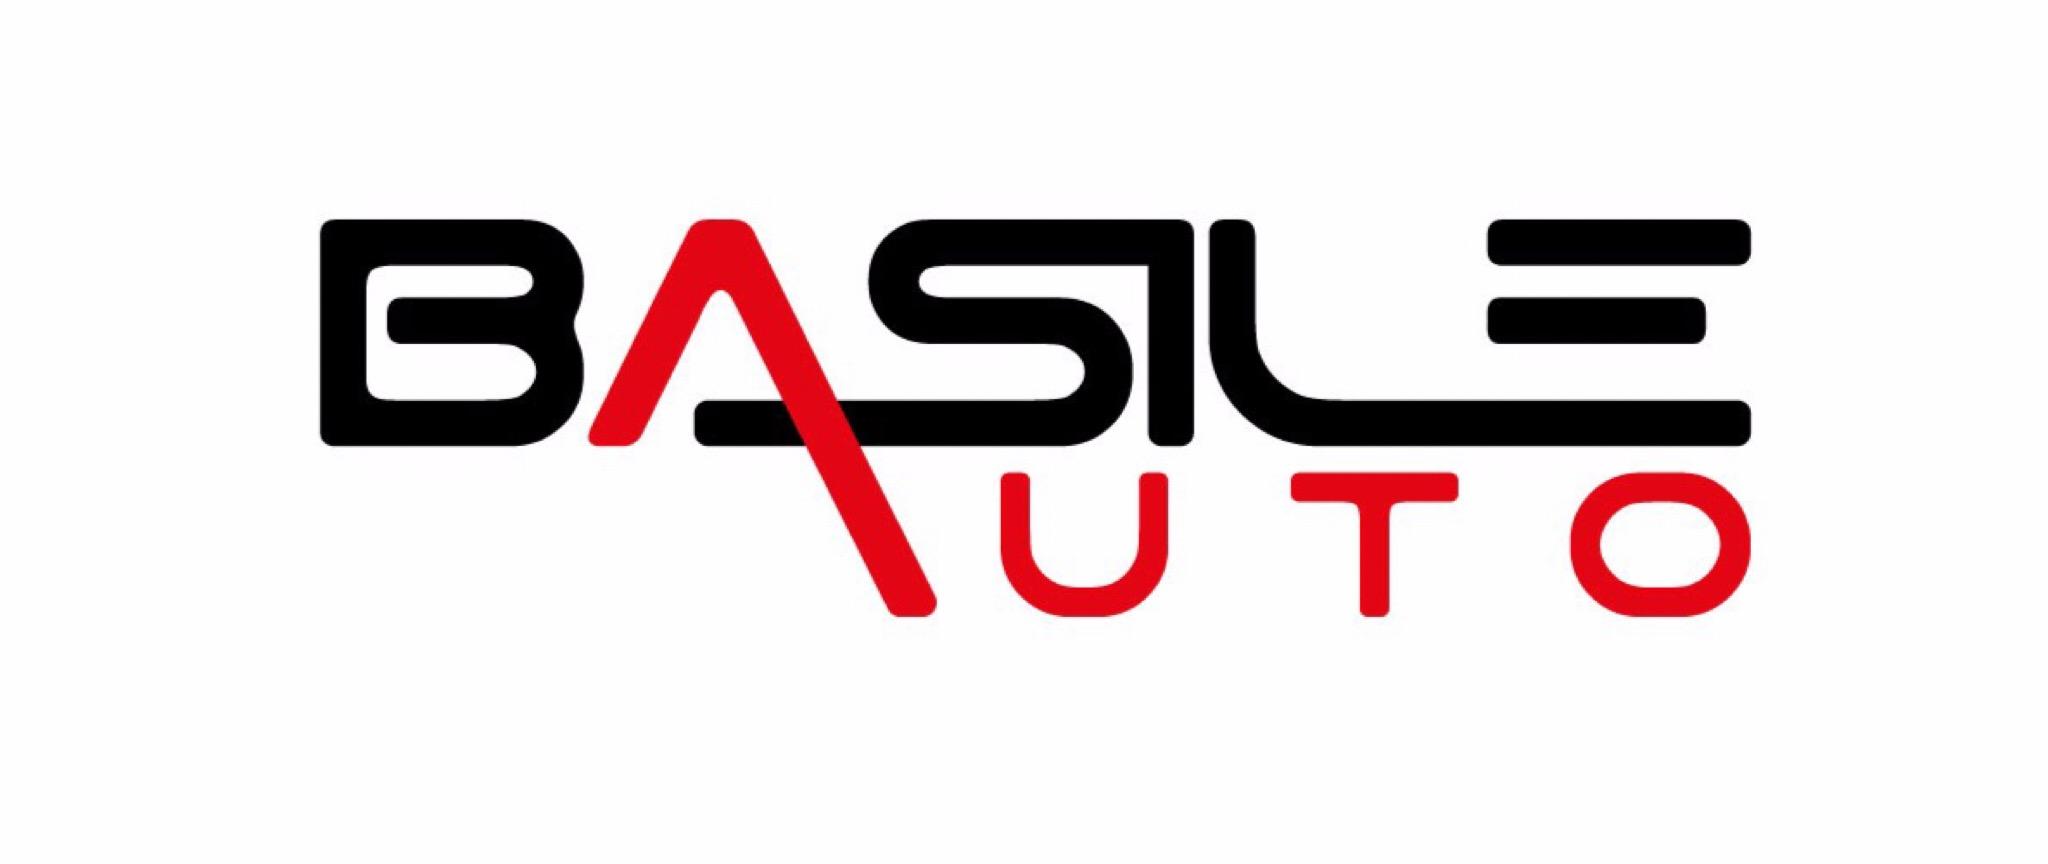 Basile Auto Srl